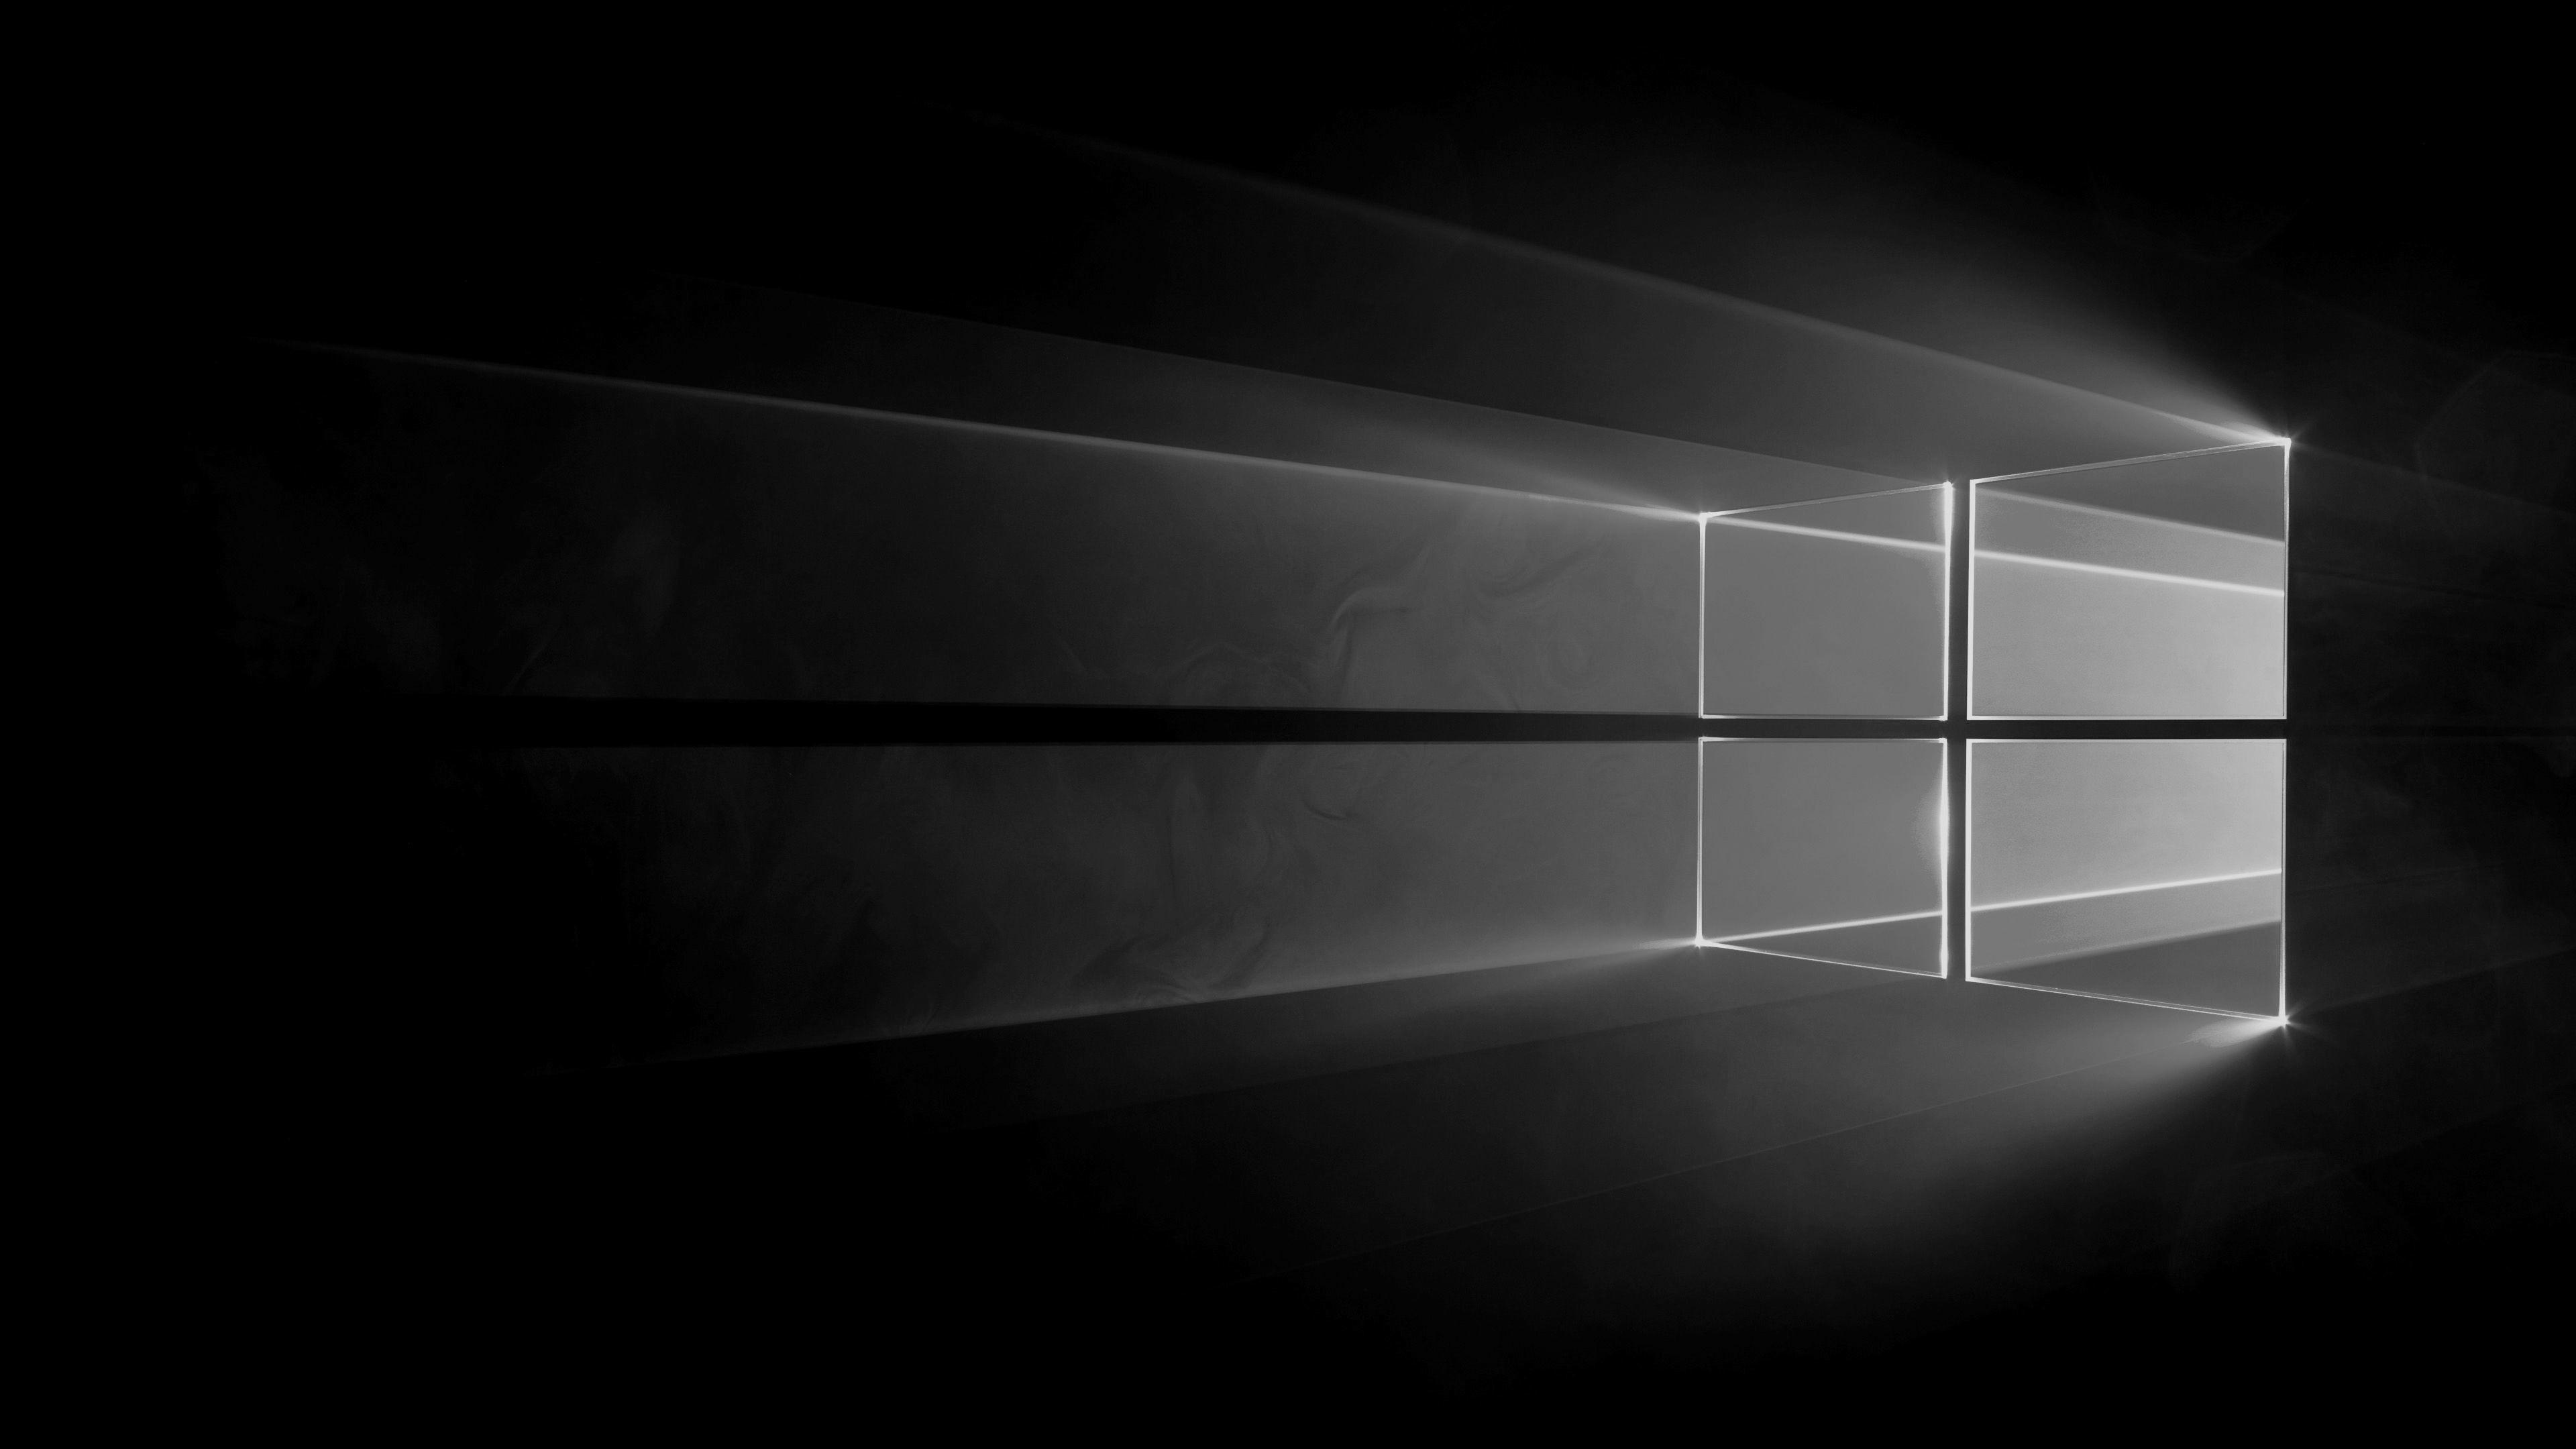 Black Windows Wallpaper 1920x1080